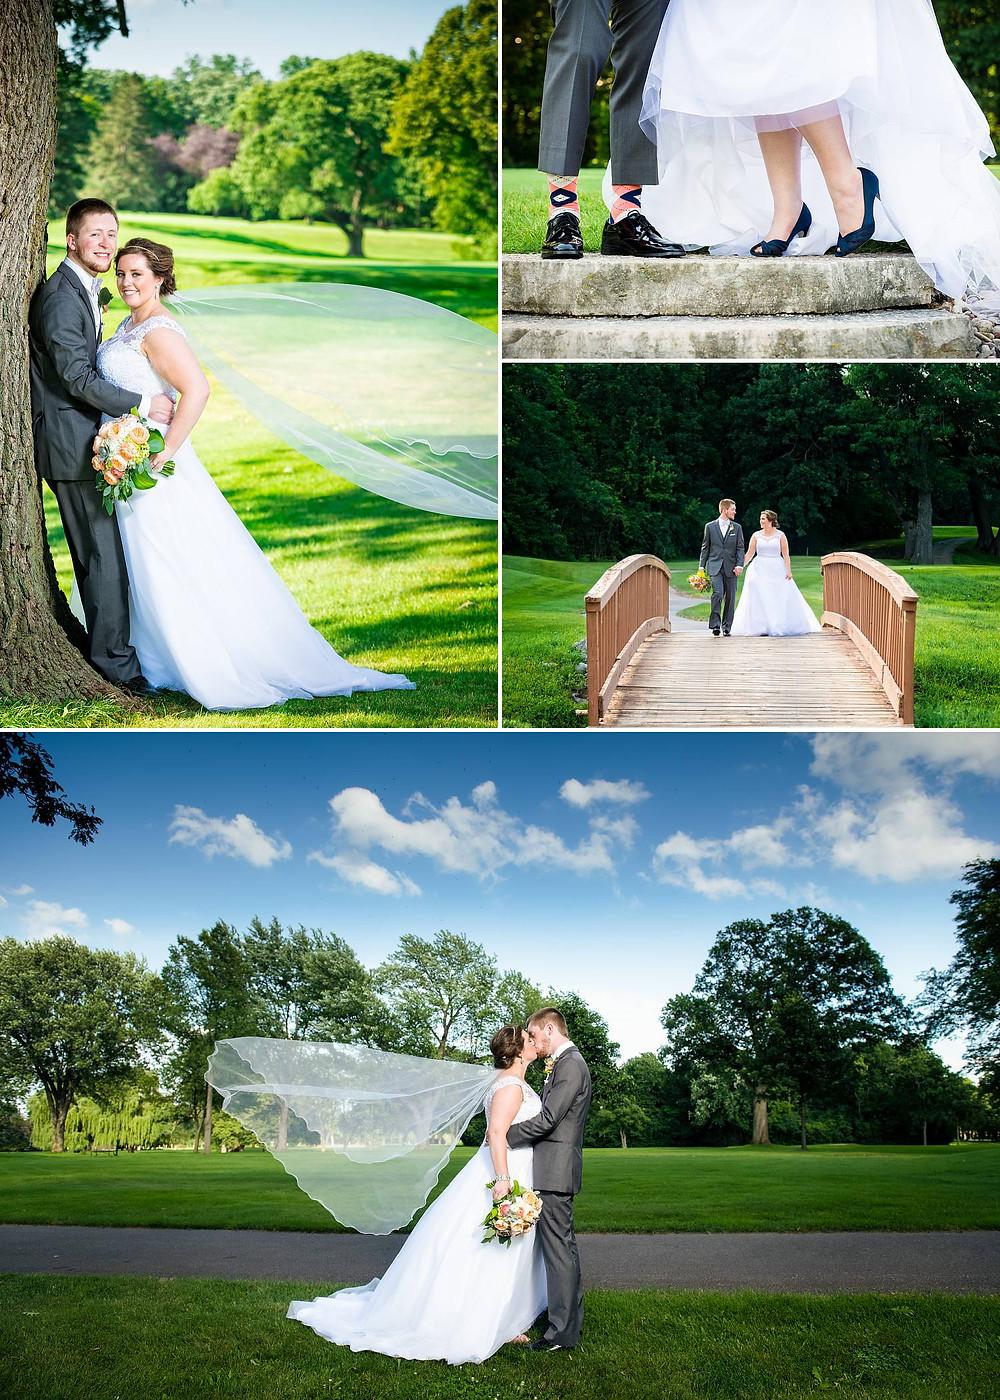 Oshkosh Wisconsin Bride Groom Wedding Portraits | Lanari Photography